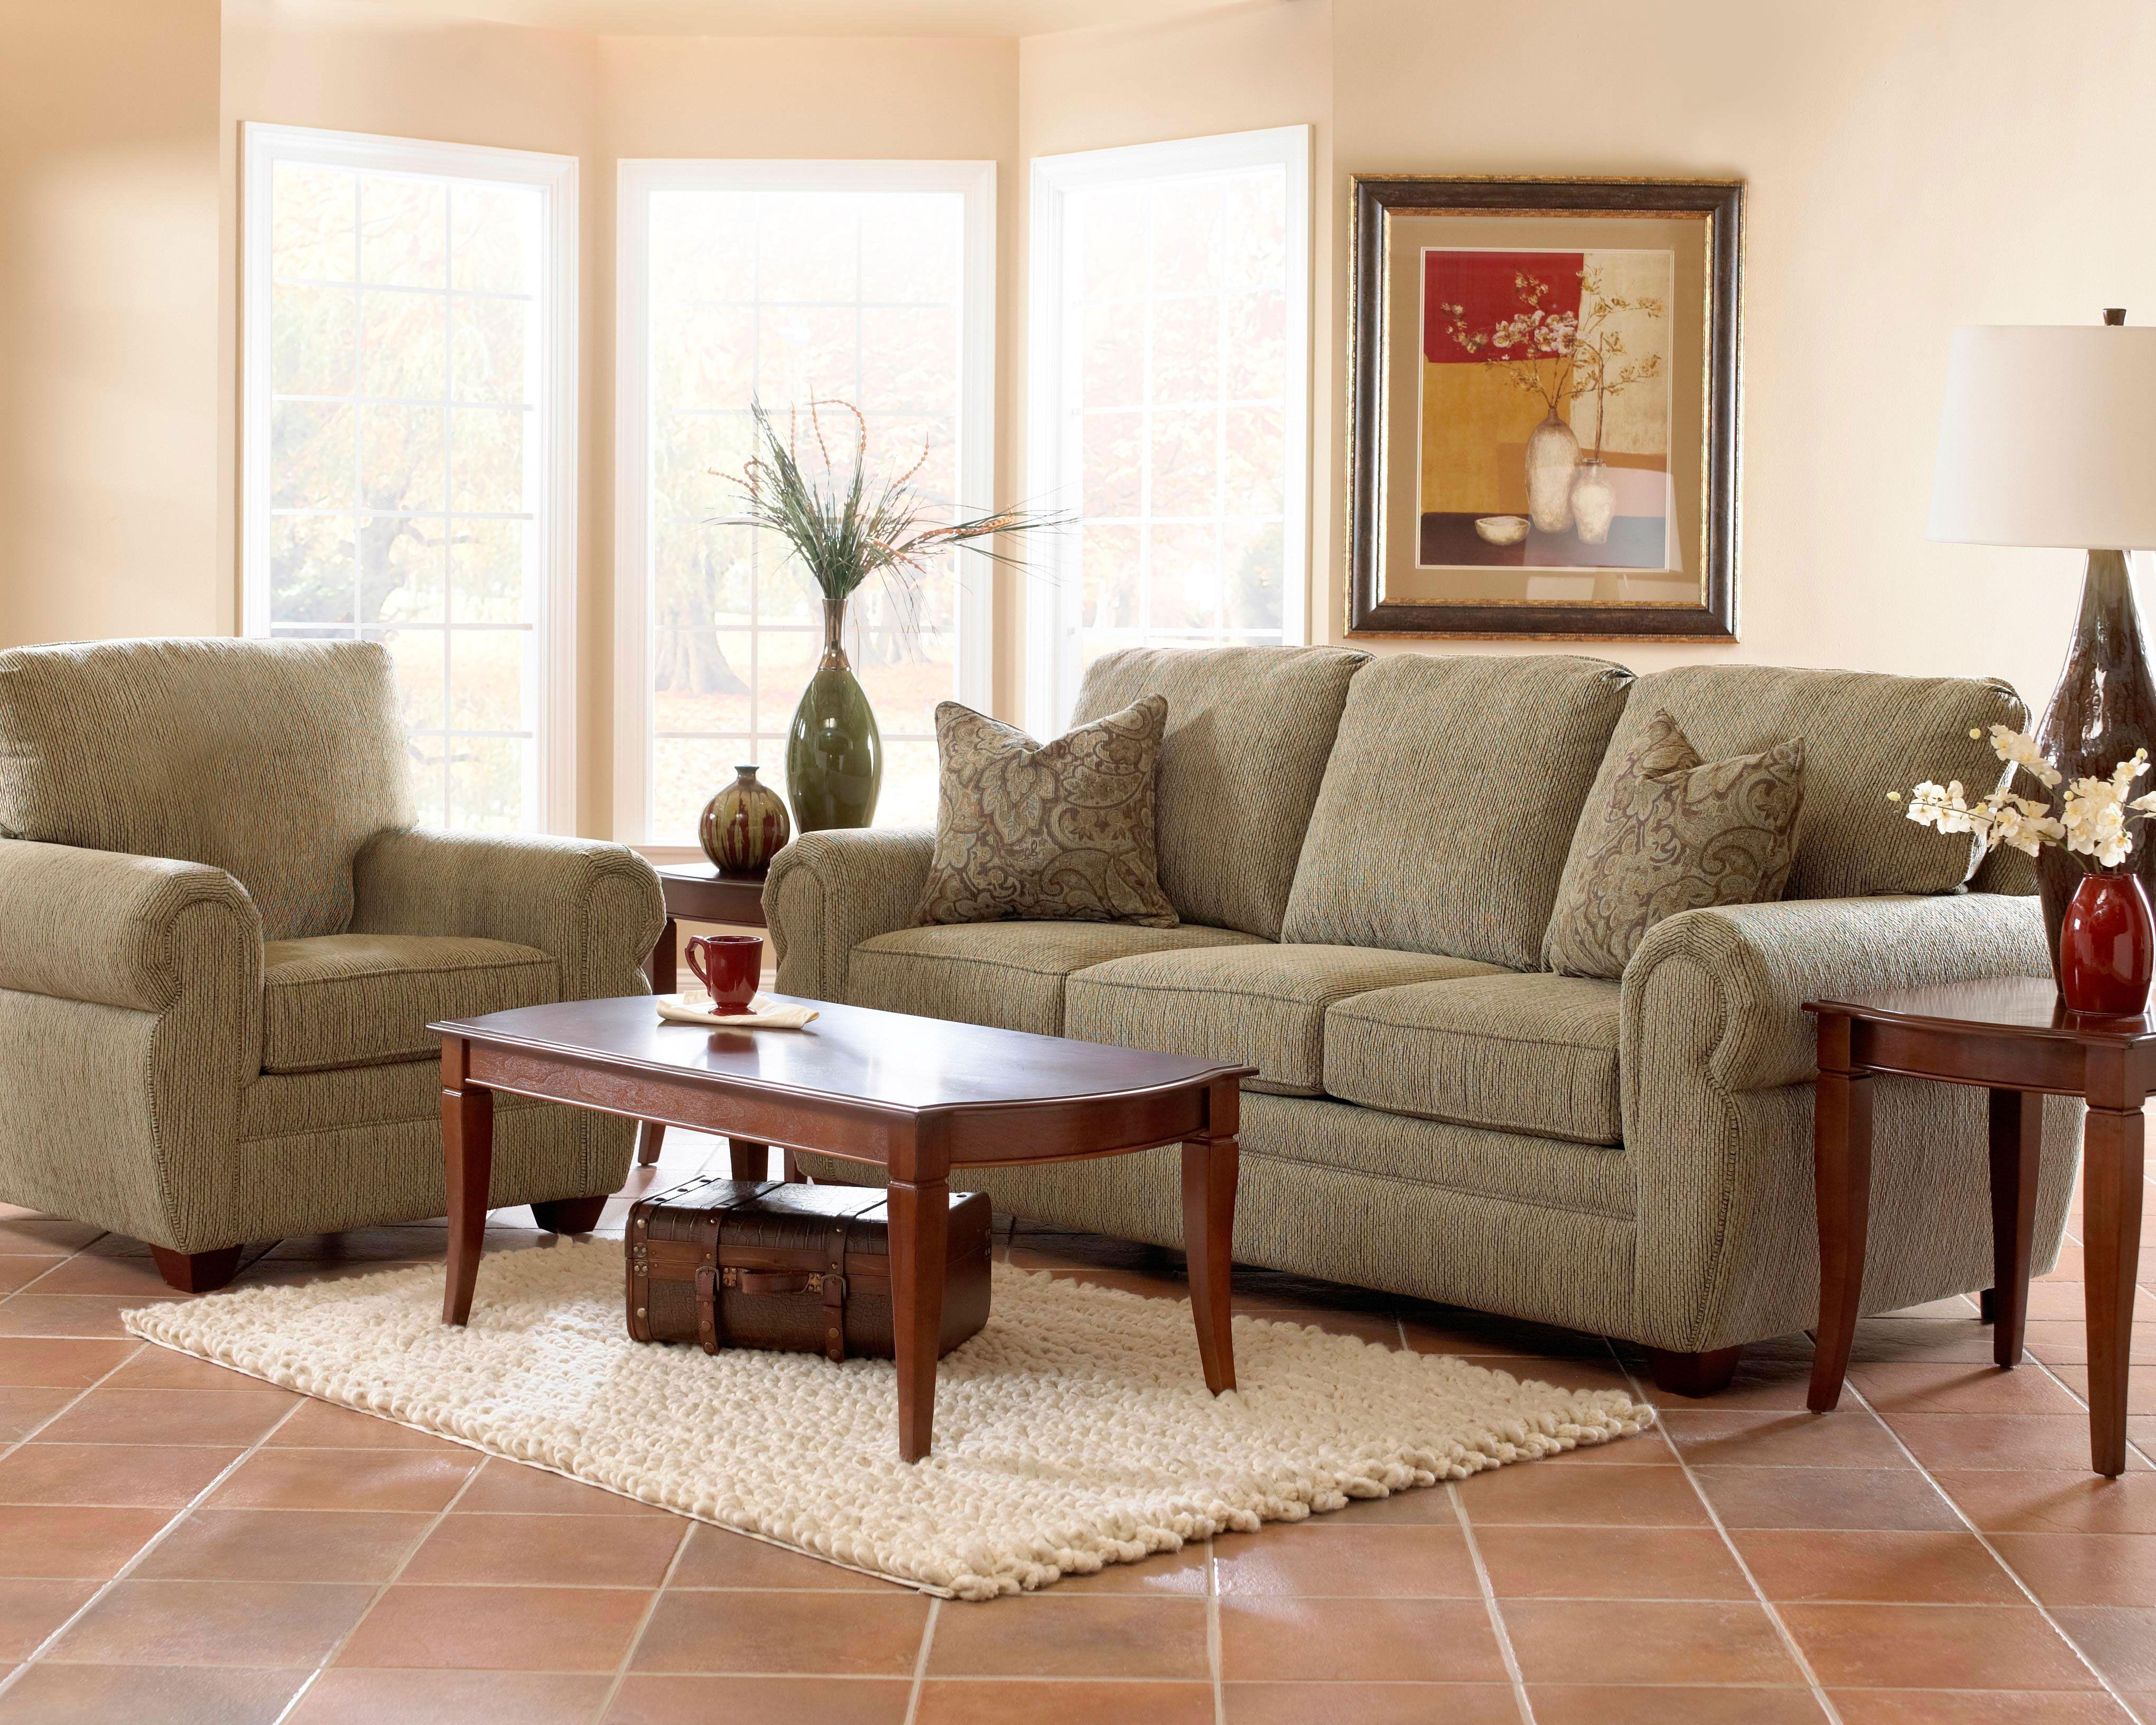 Khaki Olive Green Sofas Google Search Klaussner Furniture City Living Room Furniture